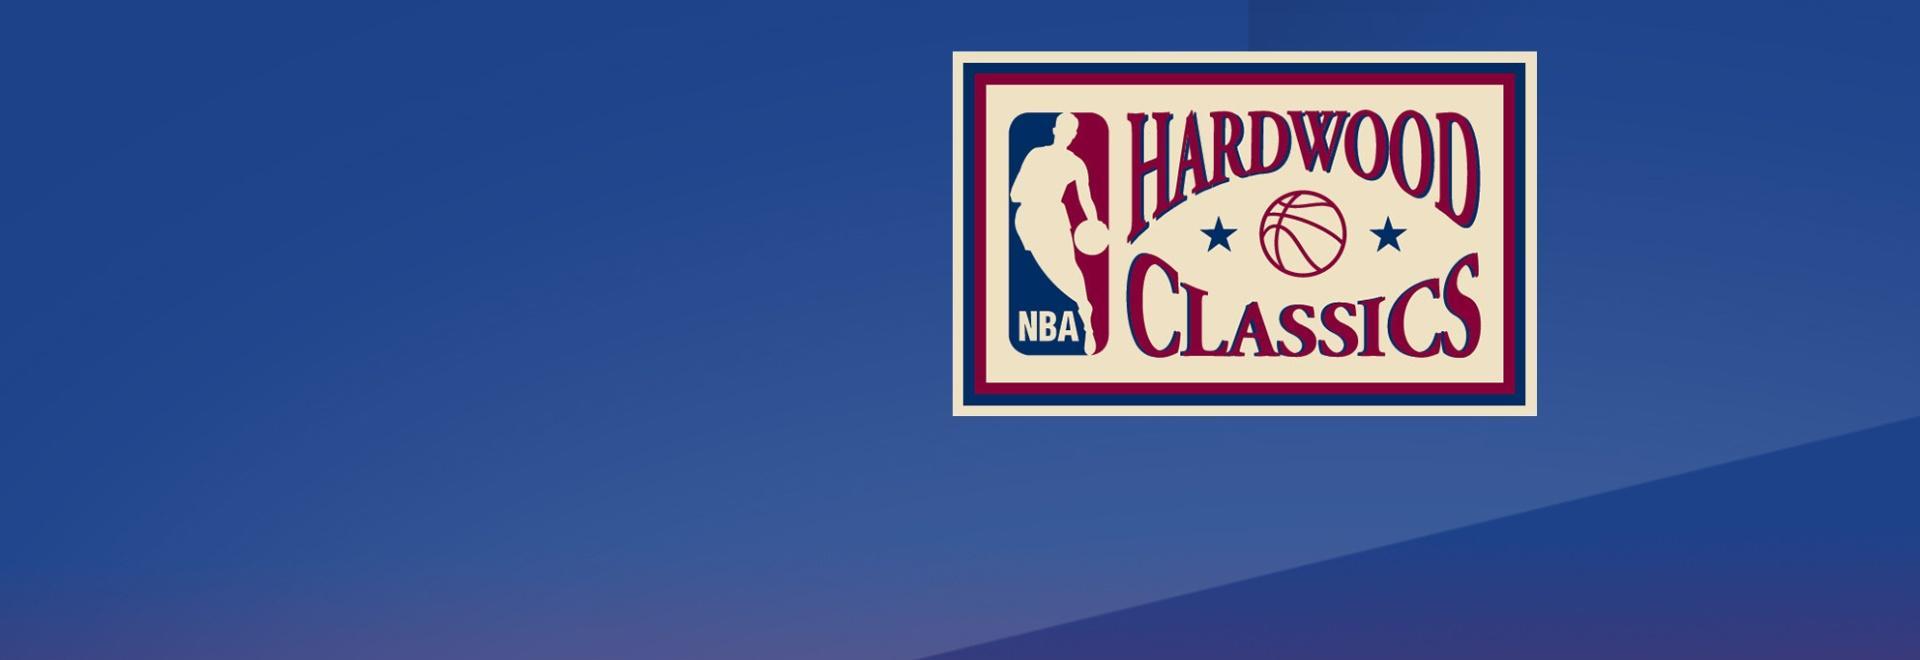 Grizzlies - Hornets 21/02/03 Mashburn: 50 points